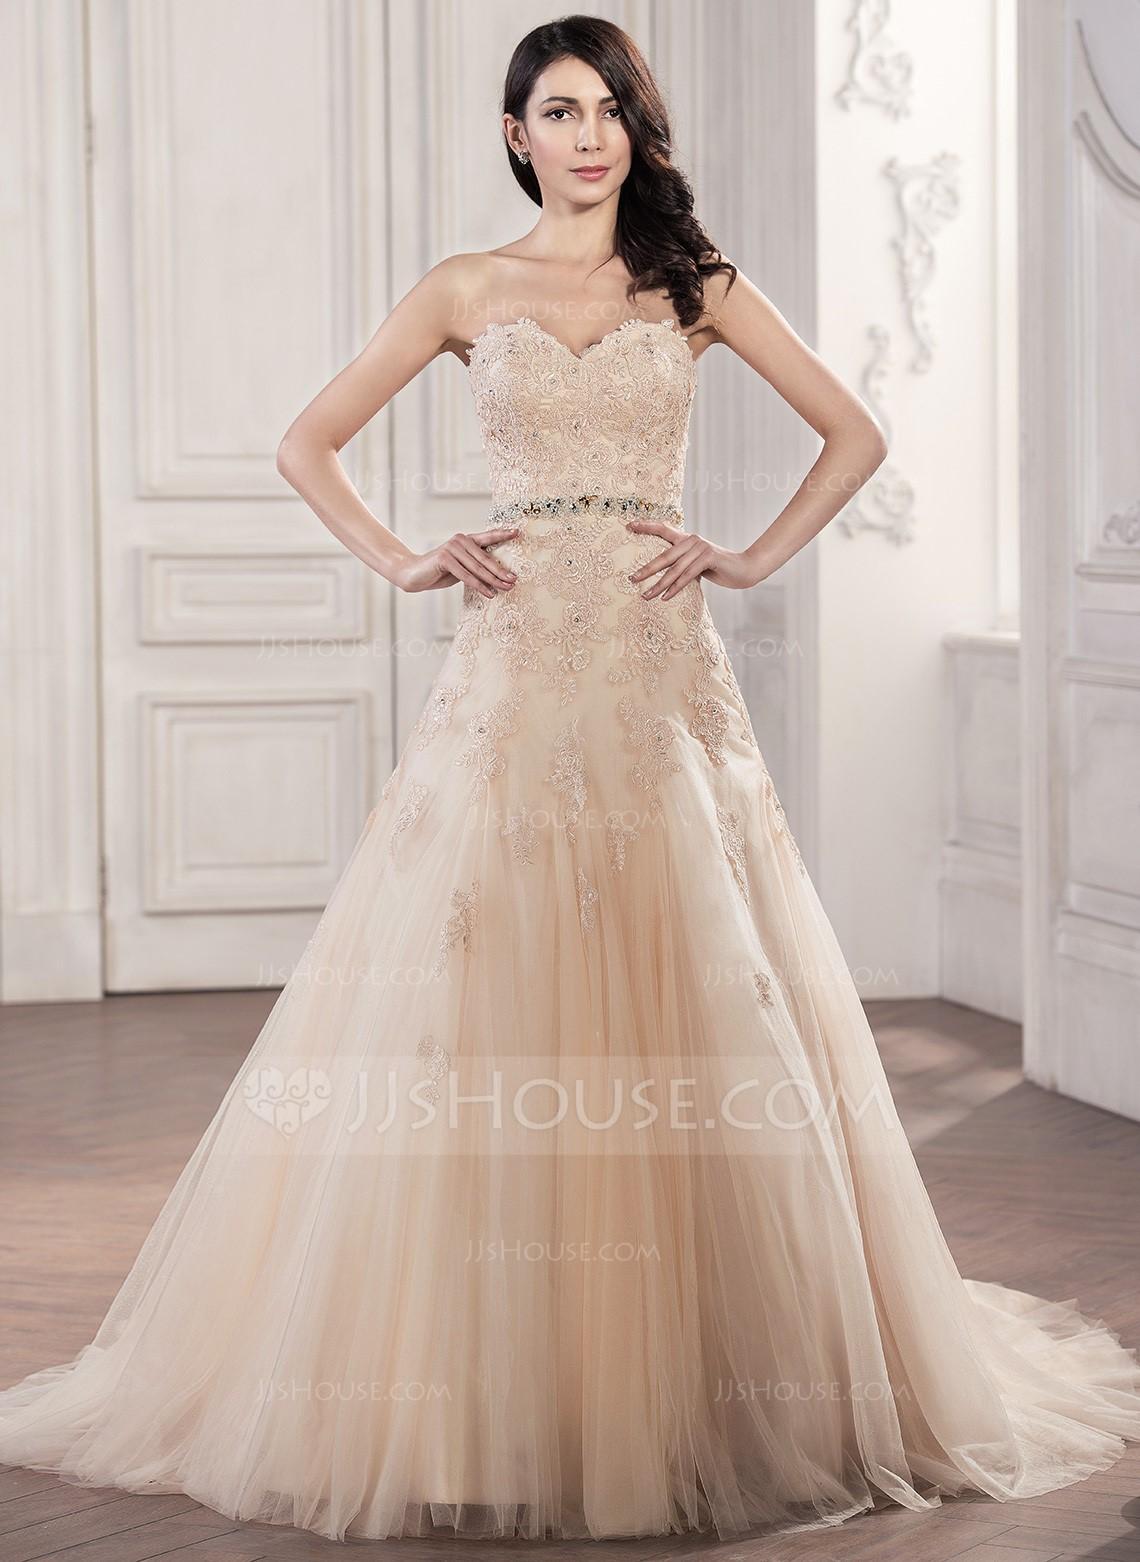 Glamour Mermaid Wedding Dresses For Your Wedding